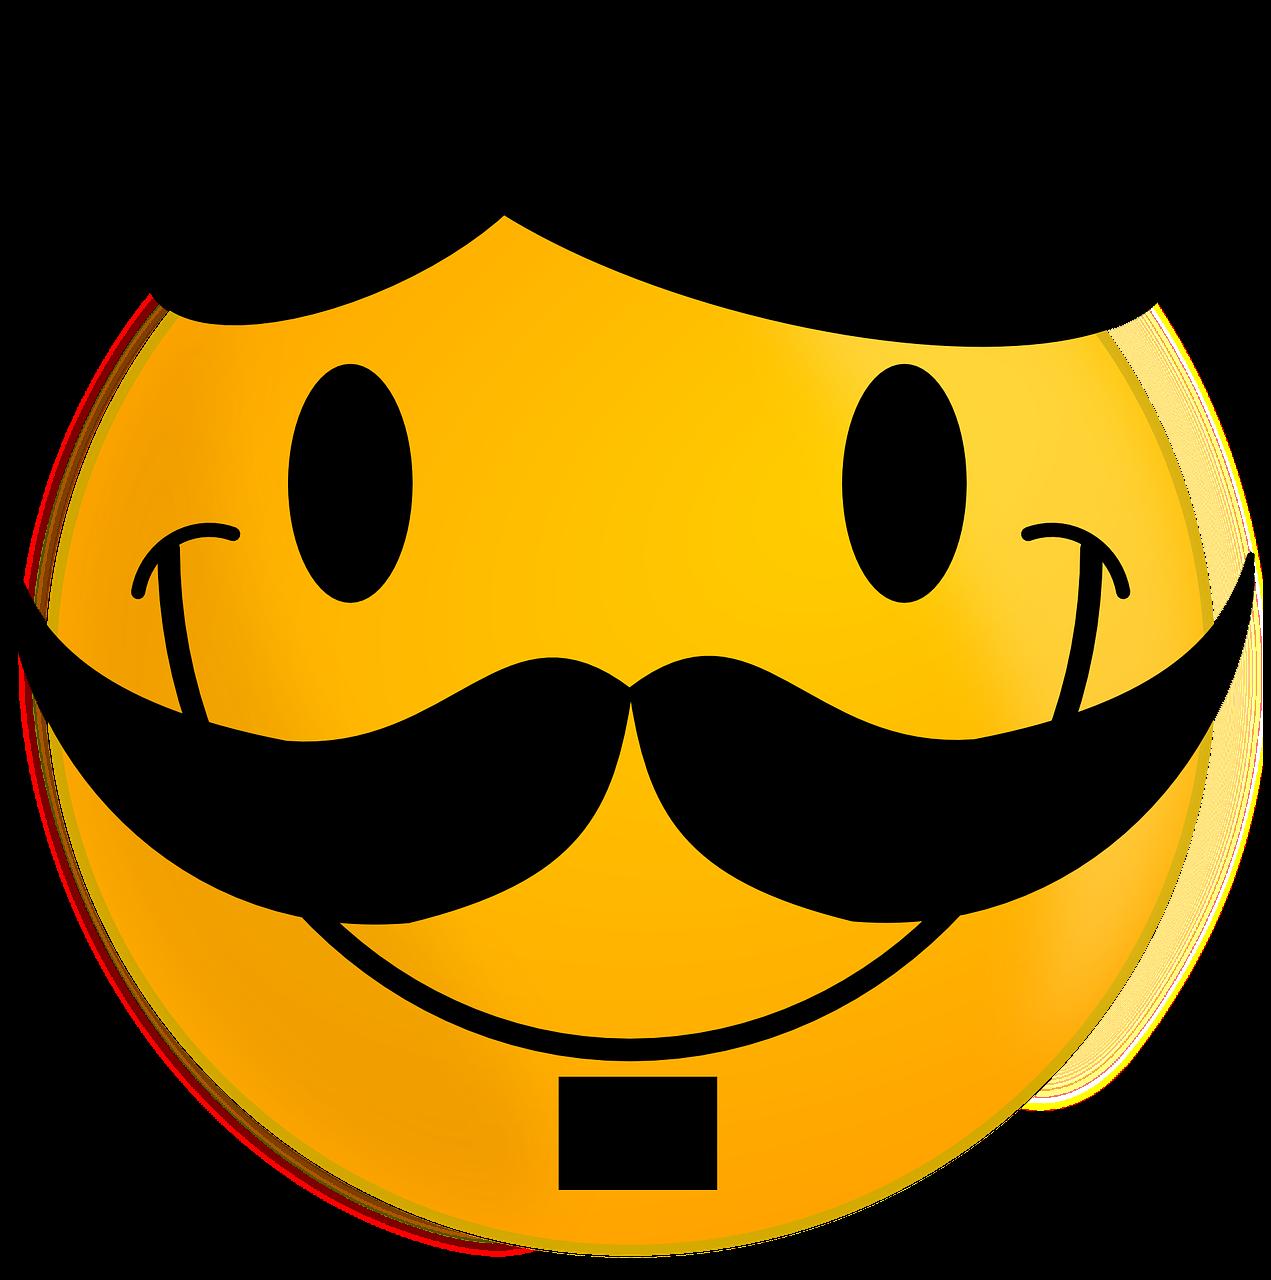 Smiley Moustache Happy   Free vector graphic on Pixabay